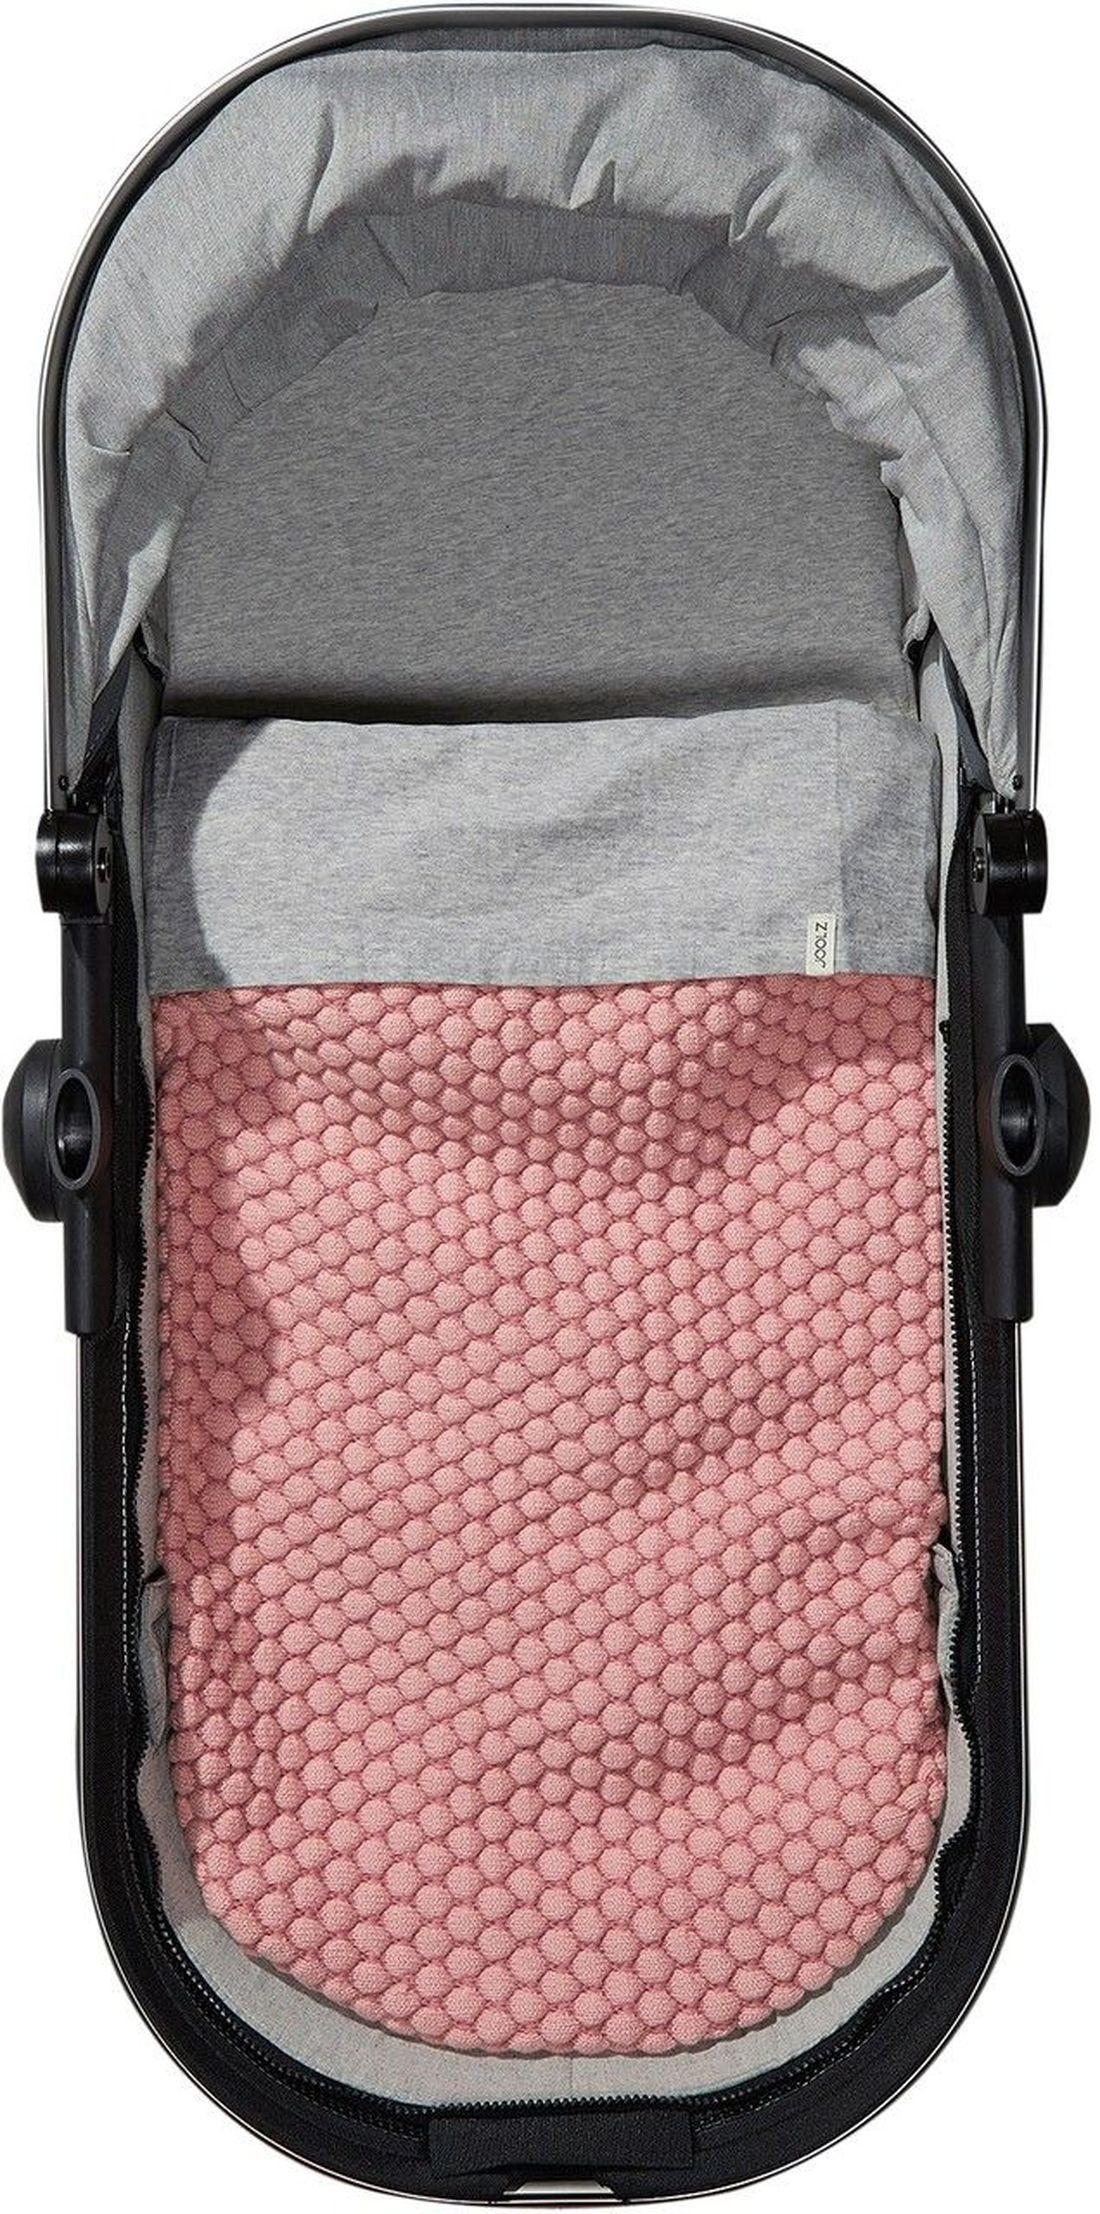 Kinderwagen Matratzenbezug